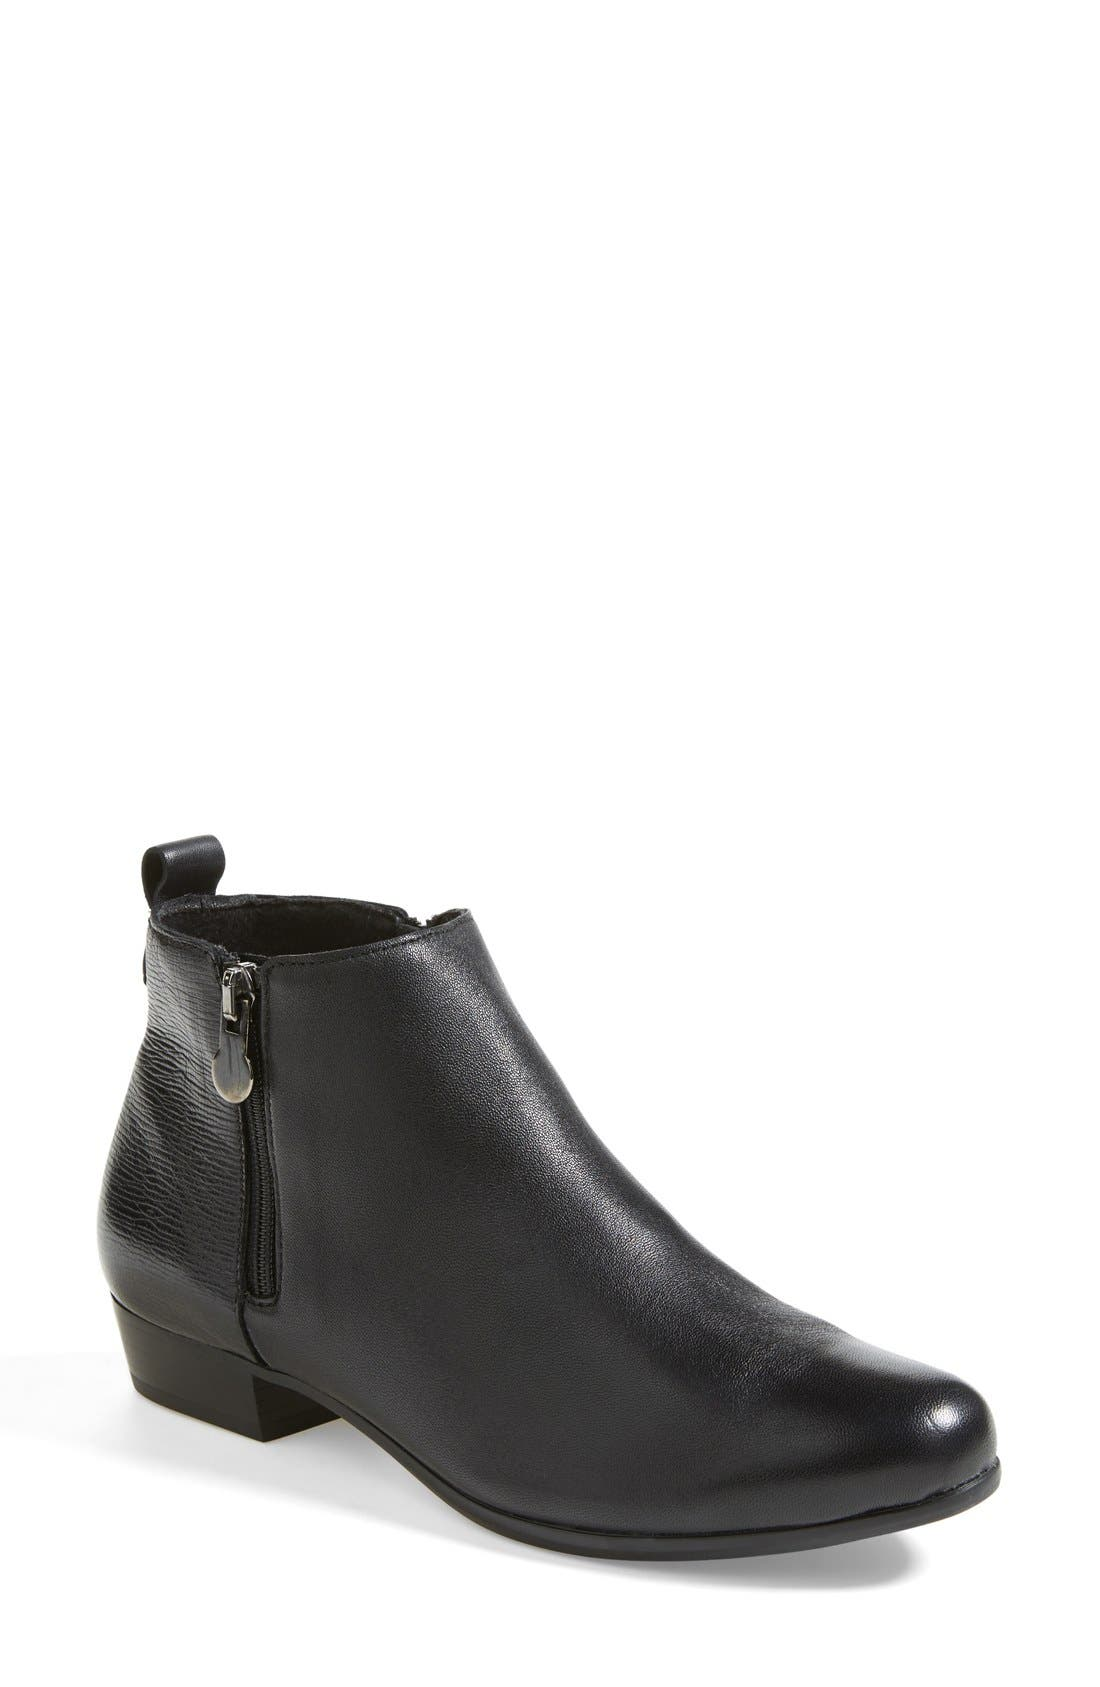 'Lexi' Boot,                             Main thumbnail 1, color,                             Black Leather